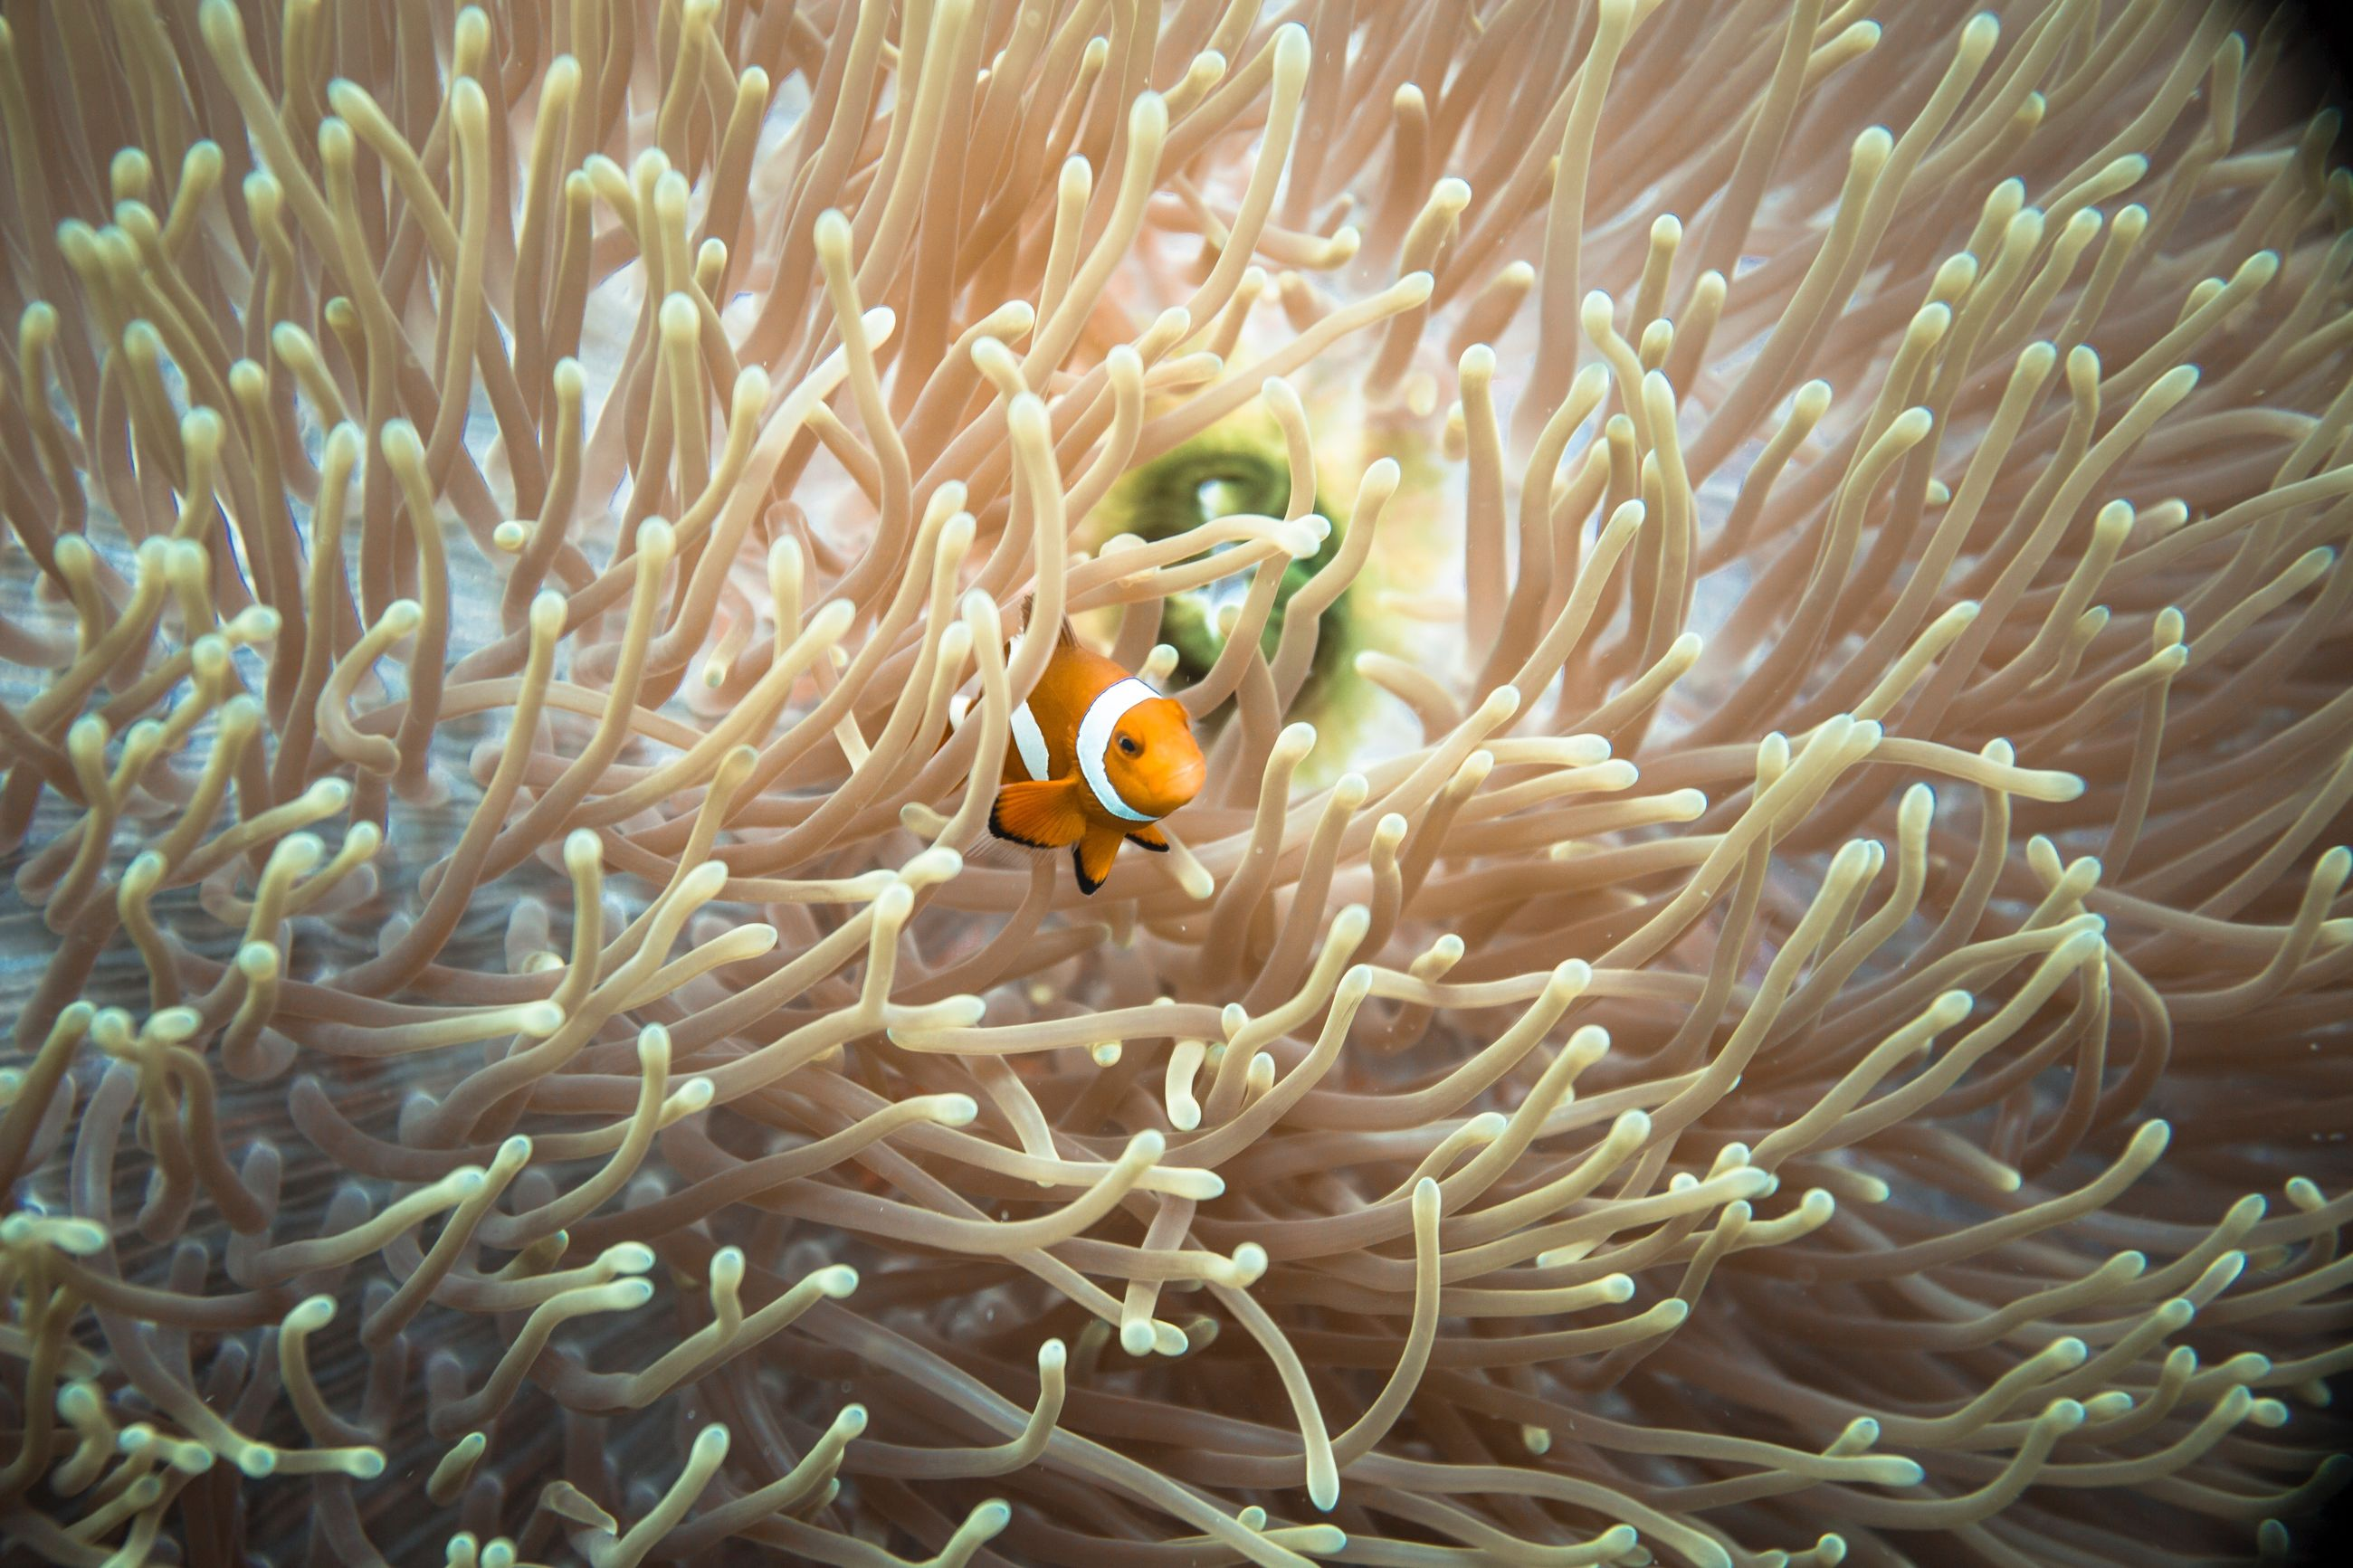 animals in the wild, clown fish, animal themes, animal wildlife, animal, sea, underwater, water, sea life, coral, undersea, marine, invertebrate, fish, beauty in nature, swimming, vertebrate, no people, group of animals, ecosystem